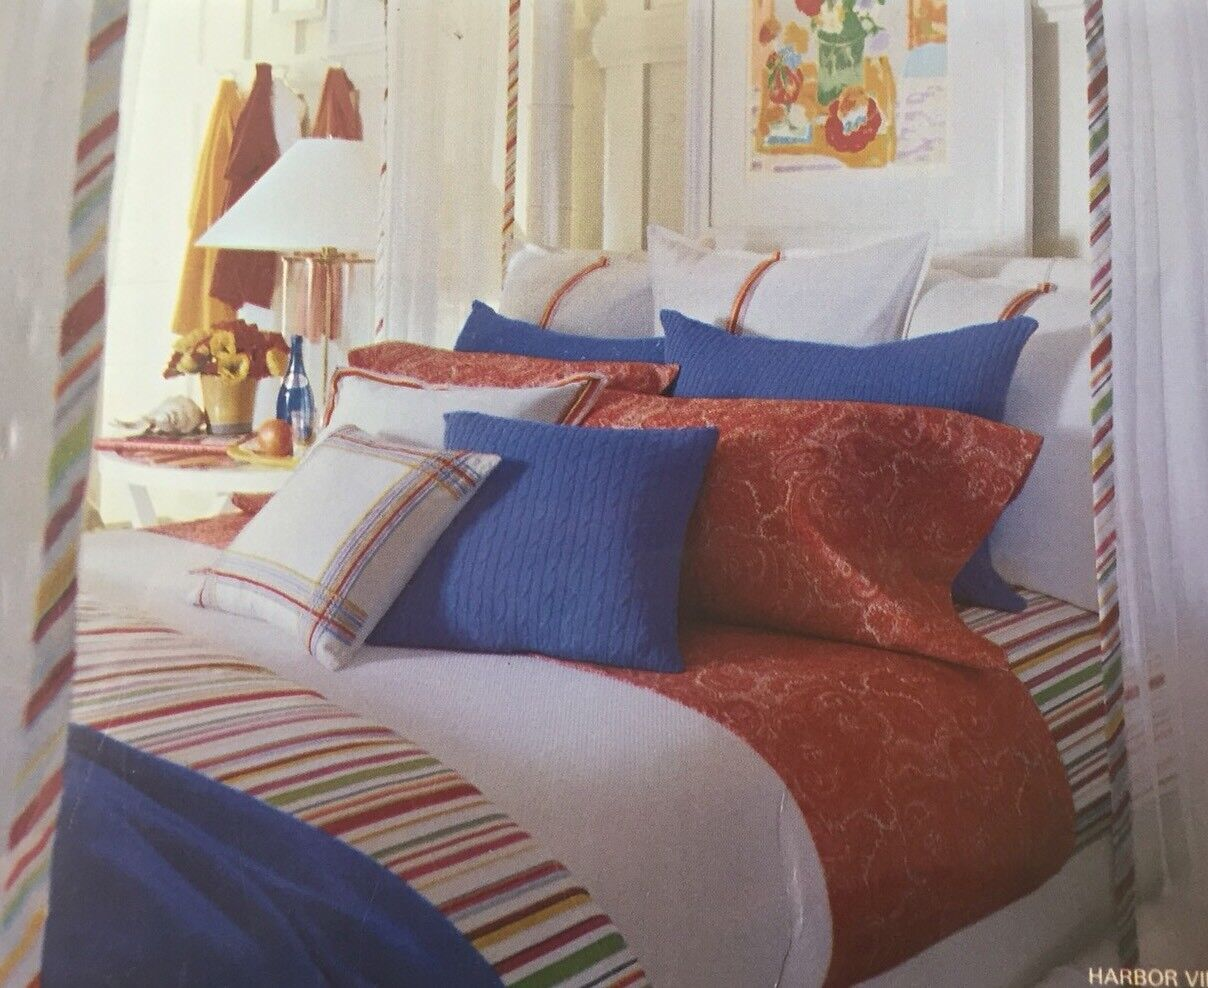 Nwt Ralph Lauren Harbor View King Pillowcases Paisley  # Muebles Ralph Lauren Espana